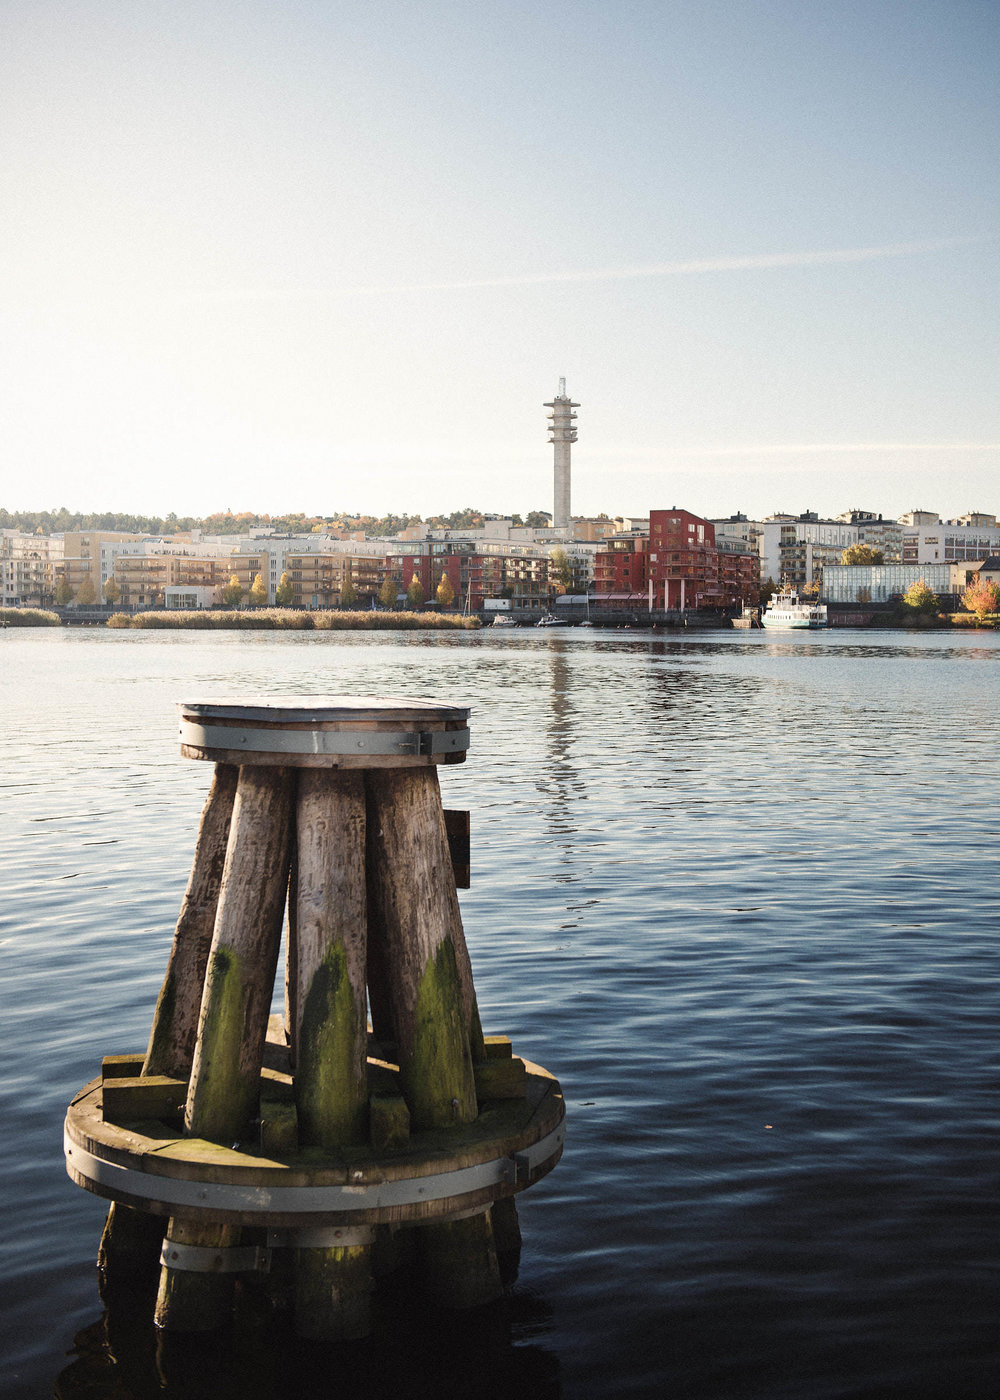 Portfolio_440_Urban Landscape ICA Sverige 2014_4_KRISTOFER SAMUELSSON PHOTOGRAPHY.jpg